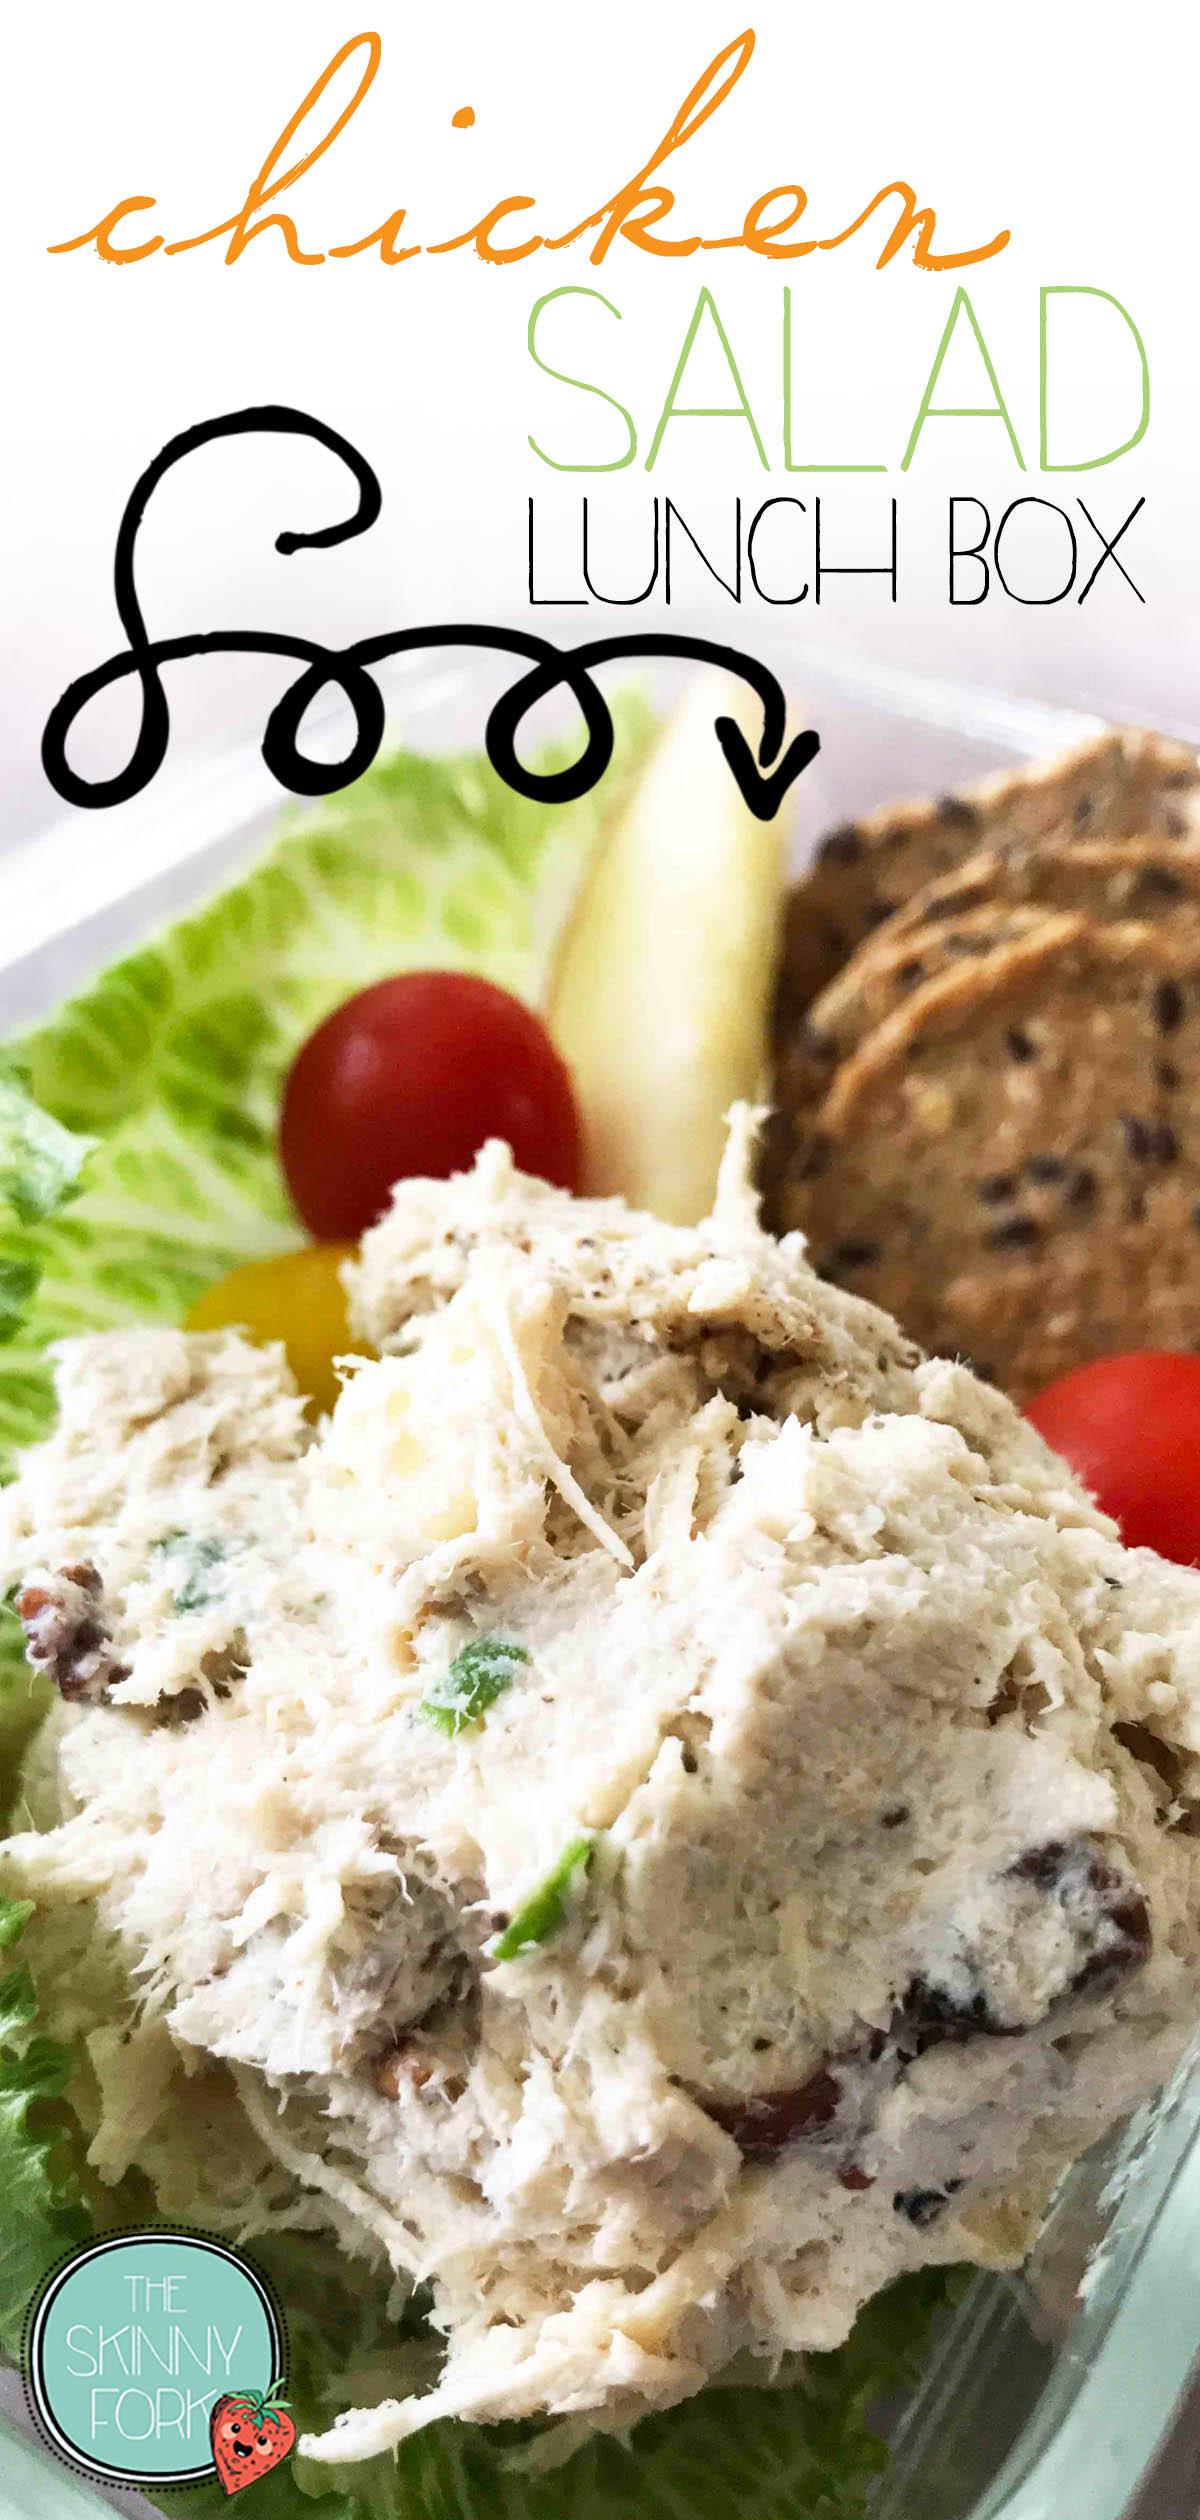 chicken-salad-lunch-box-pin.jpg